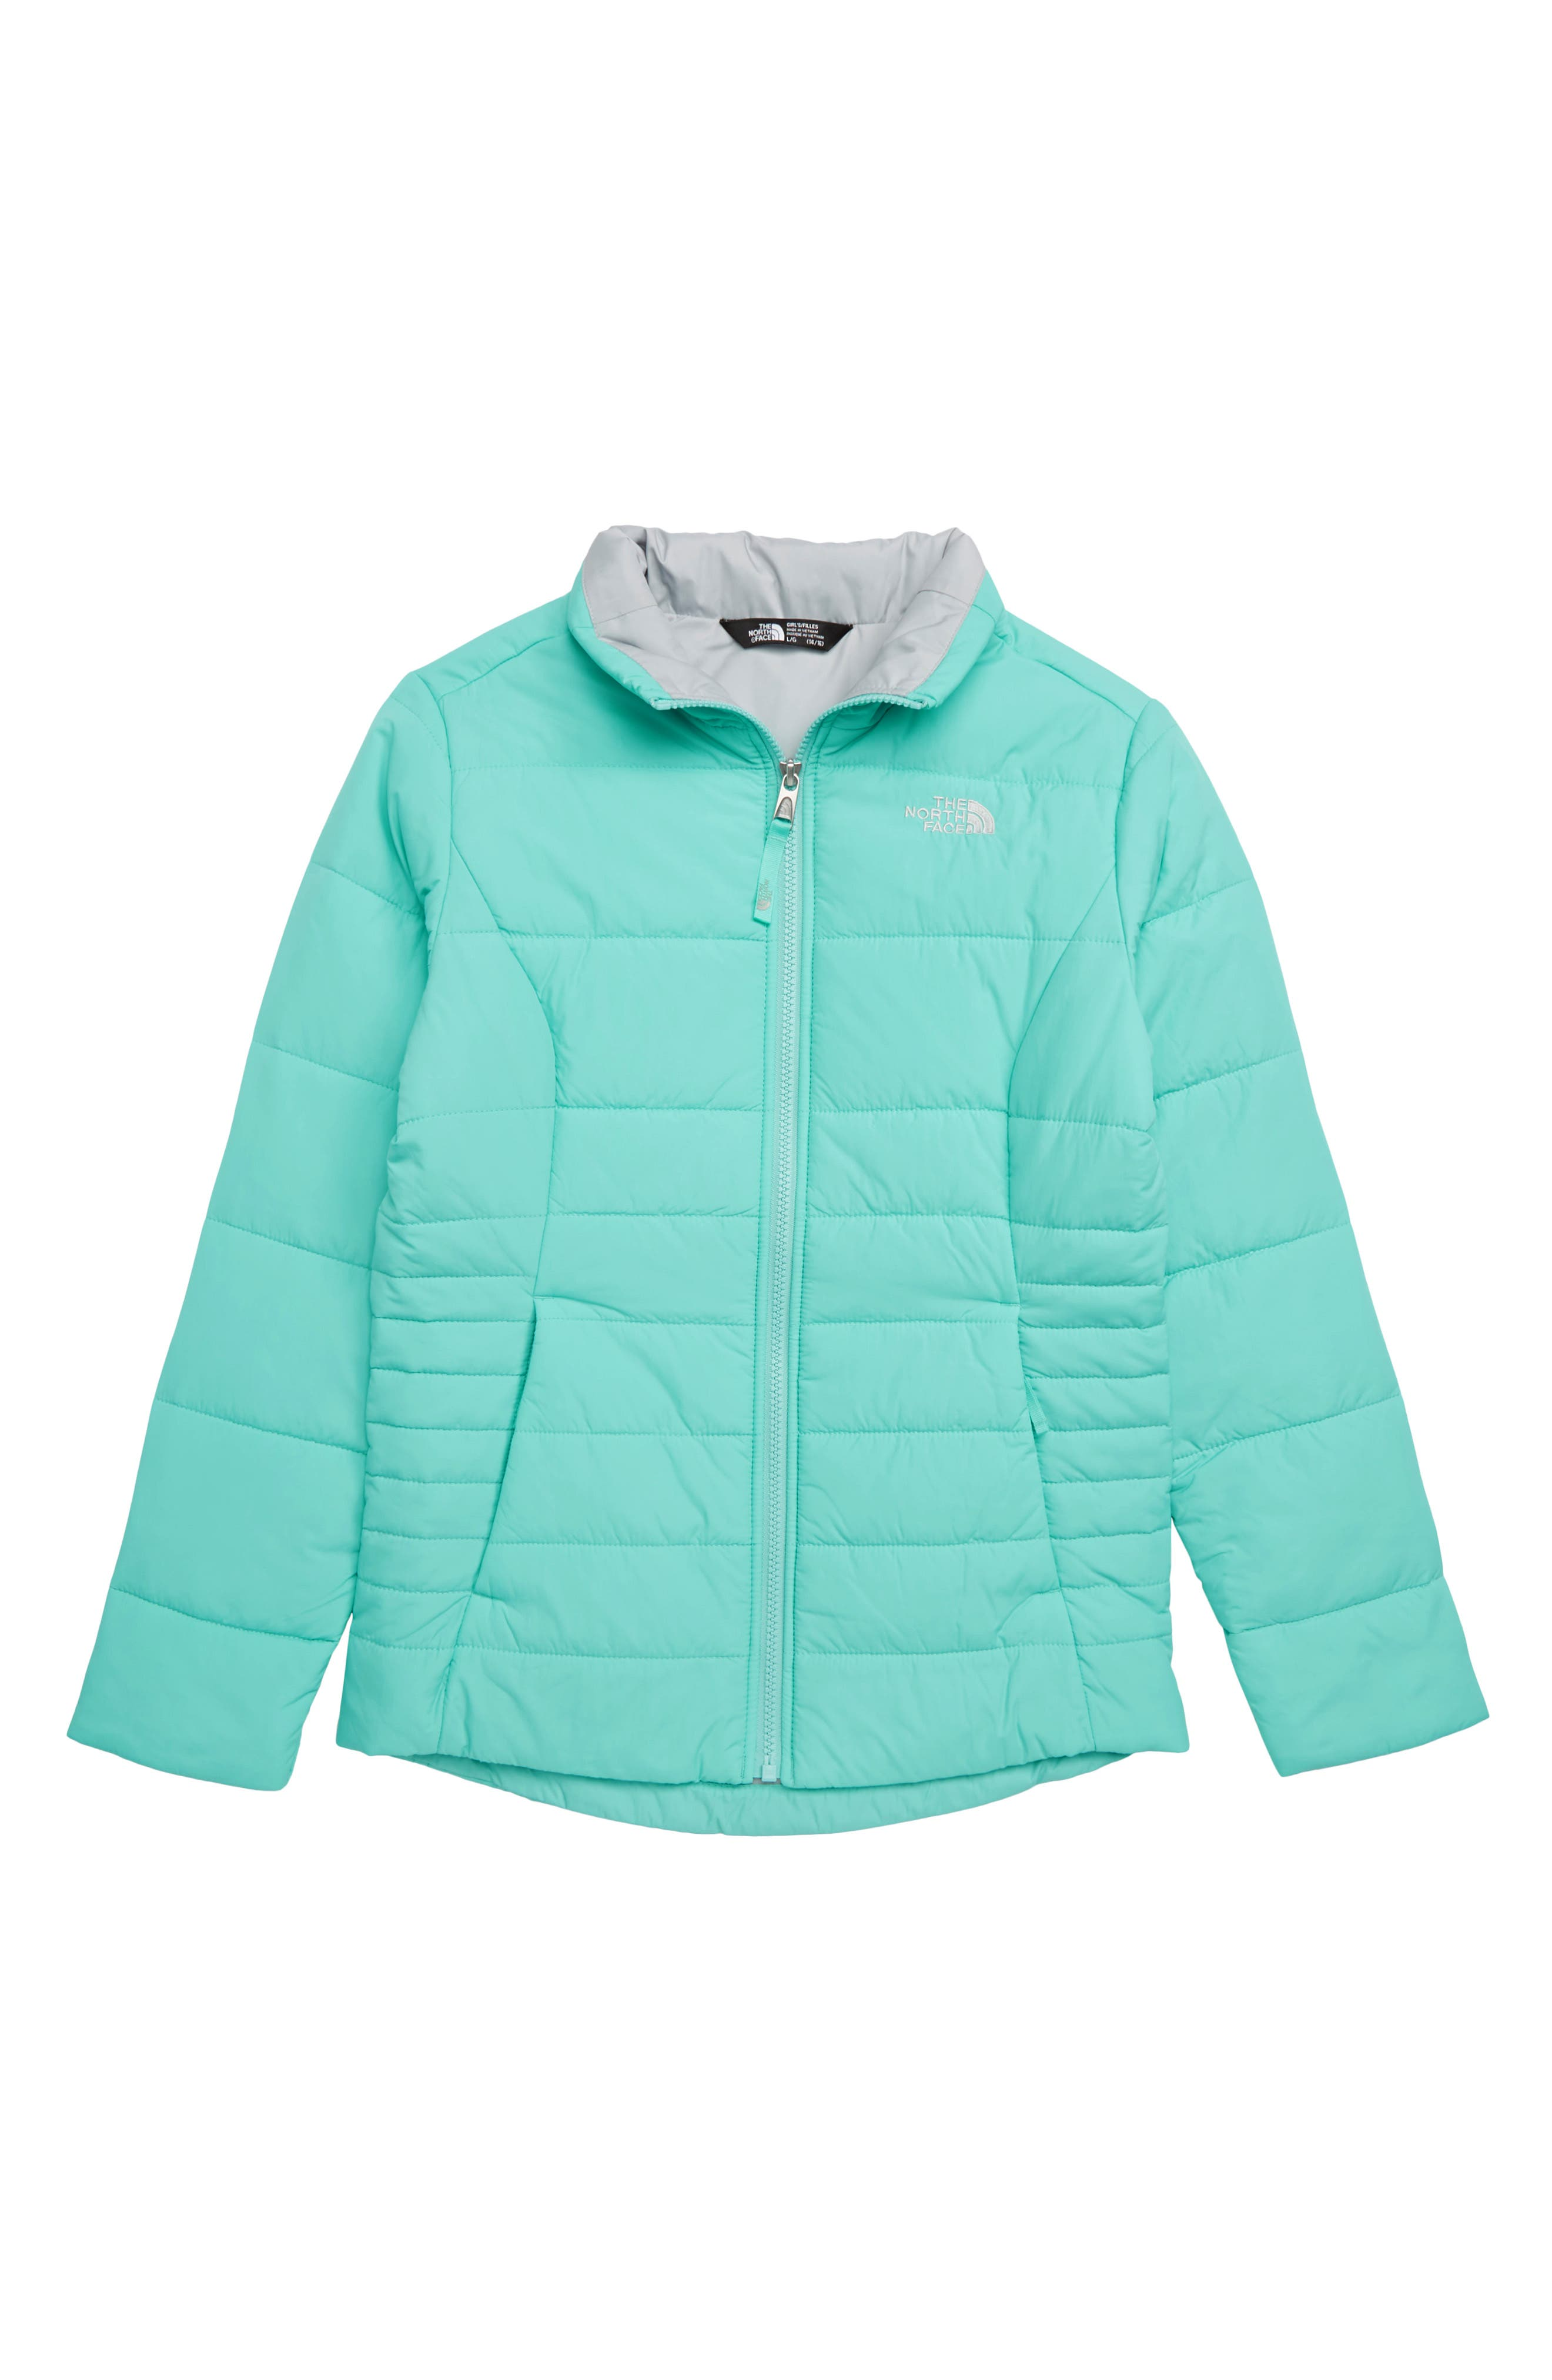 Harway Heatseeker<sup>™</sup>Water-Resistant Jacket,                             Main thumbnail 1, color,                             MINT BLUE